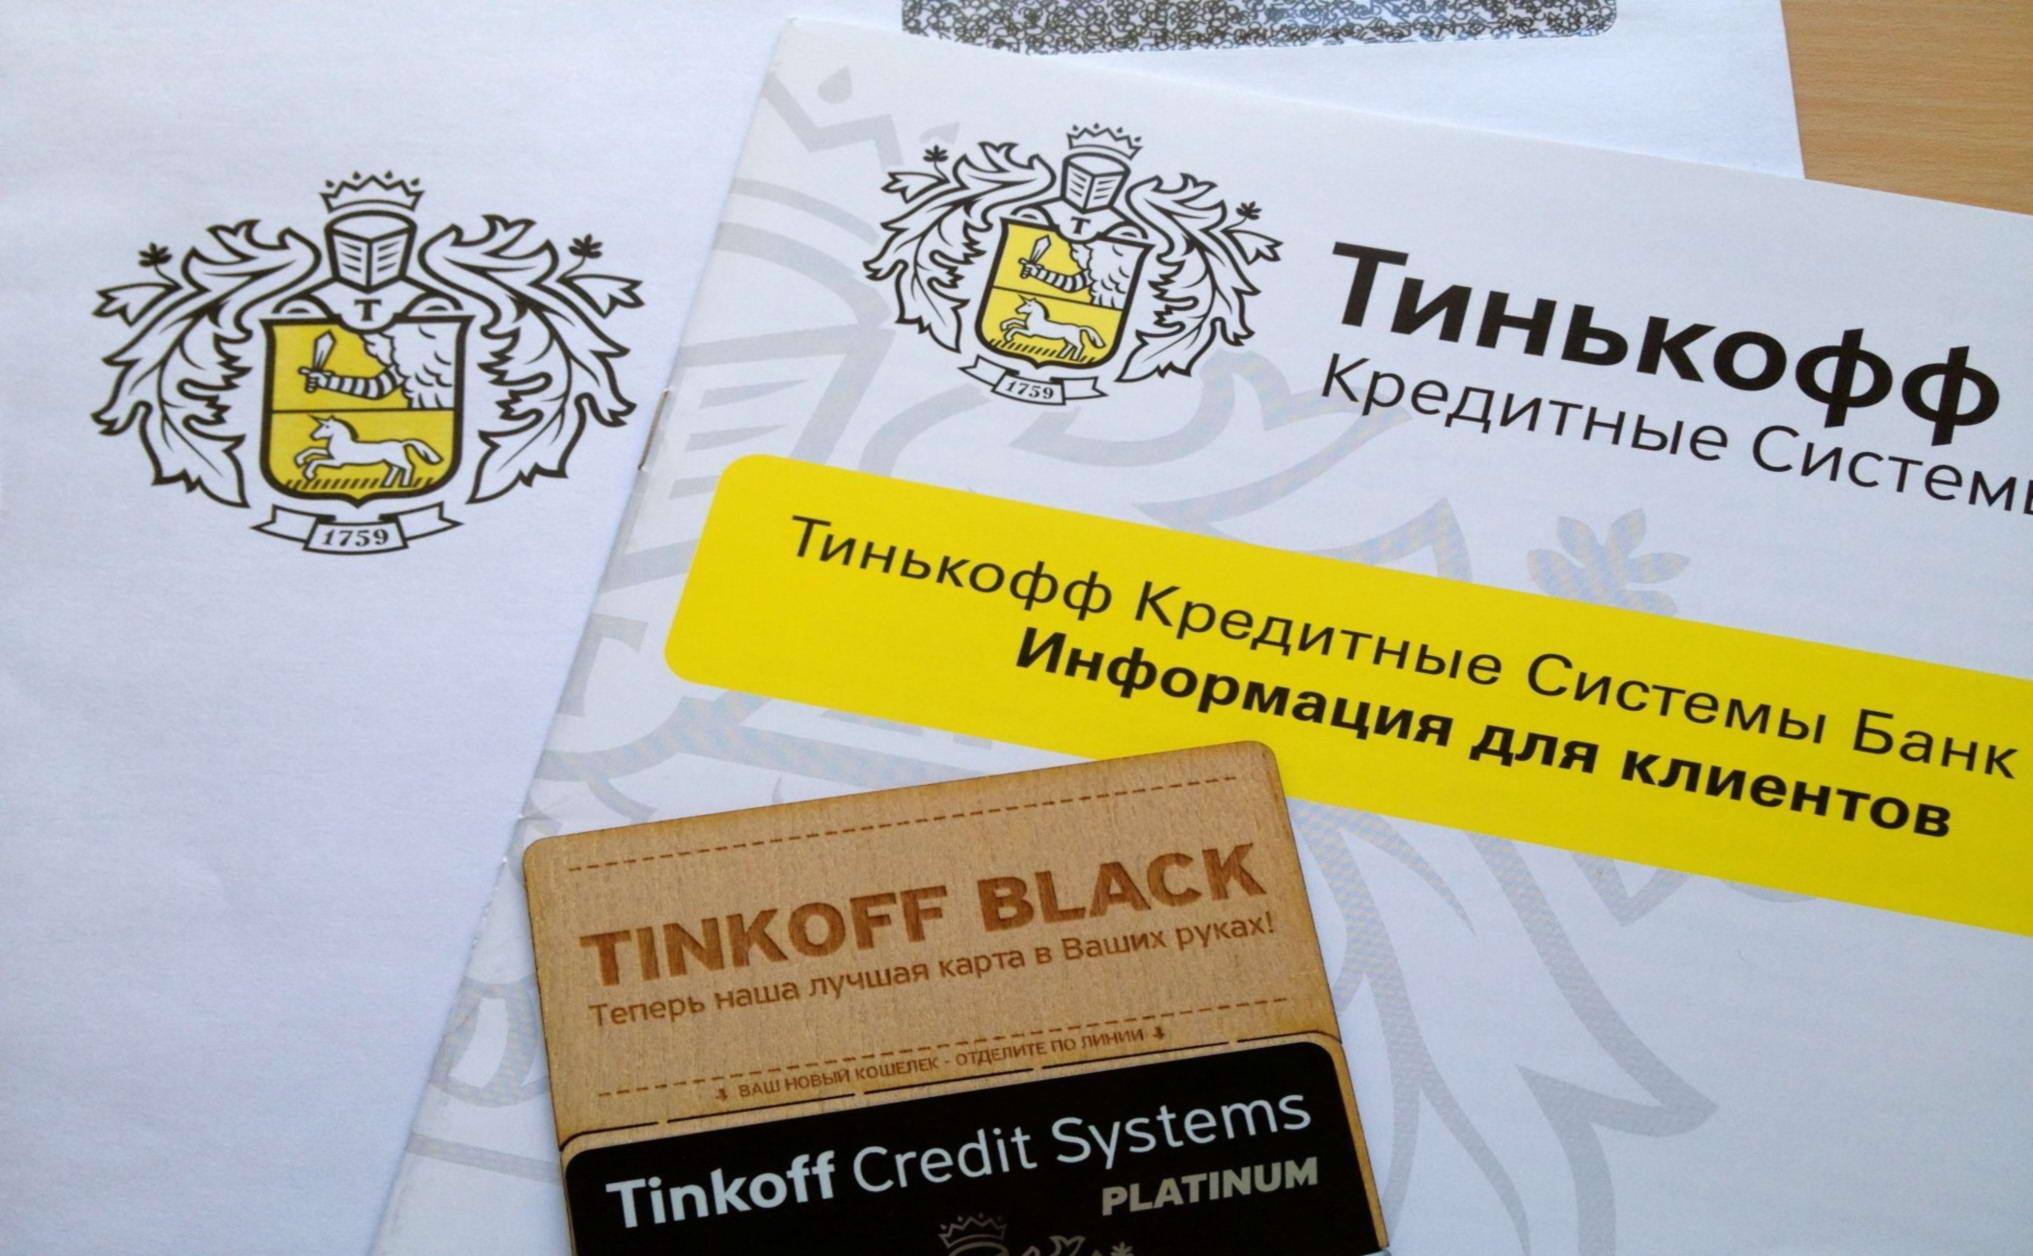 кредит в Тинькофф